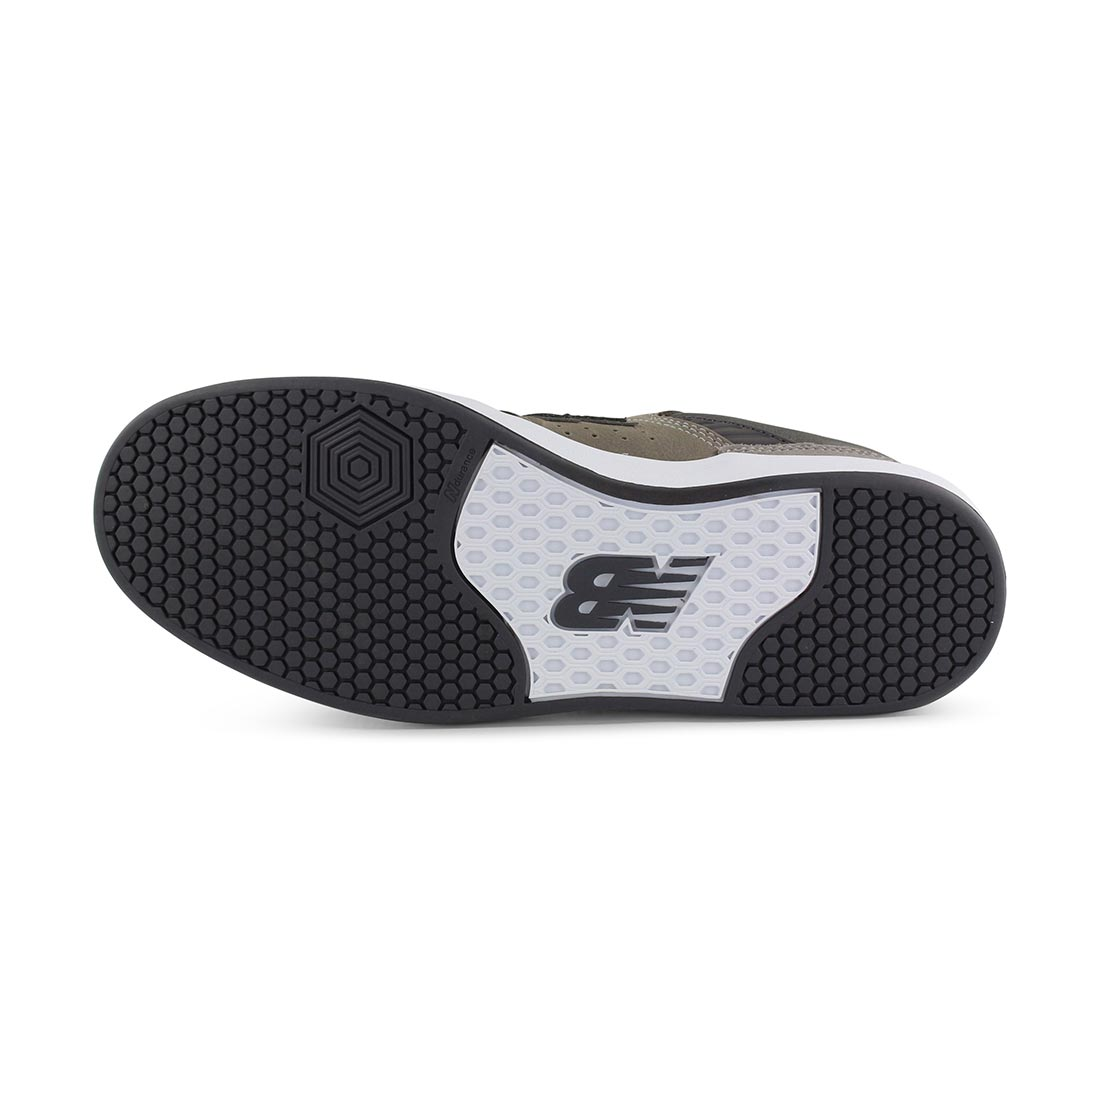 New Balance 598 Grey